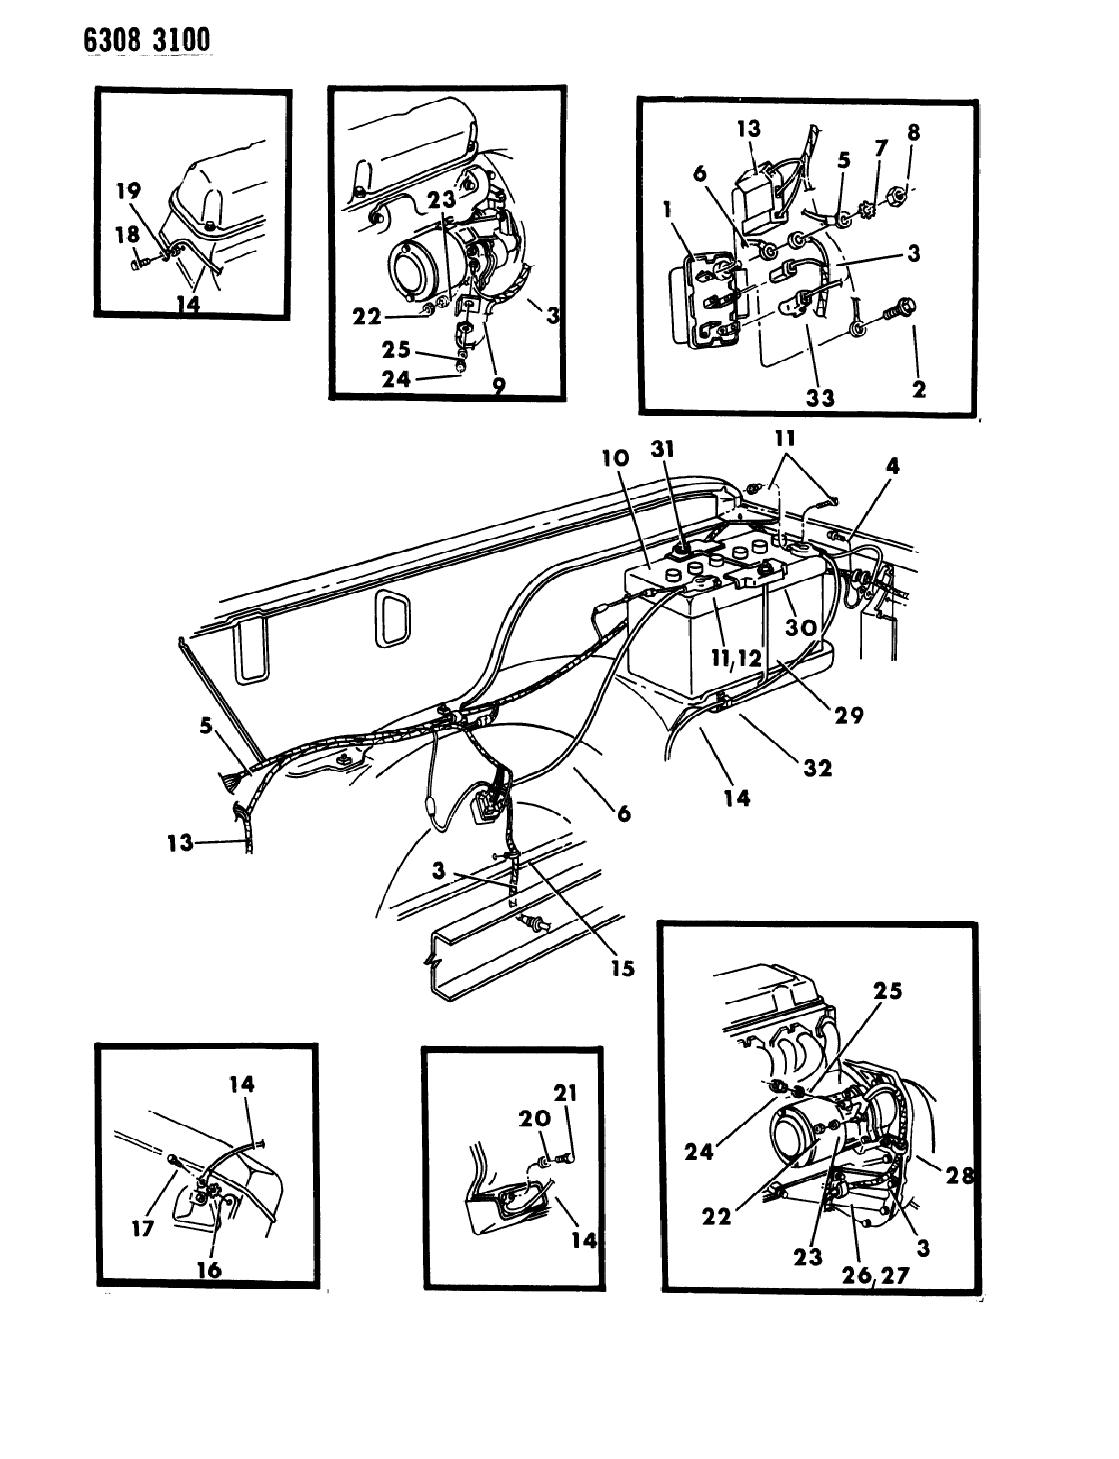 1987 Dodge D150 Wiring - Battery & Starter - Mopar Parts Giant